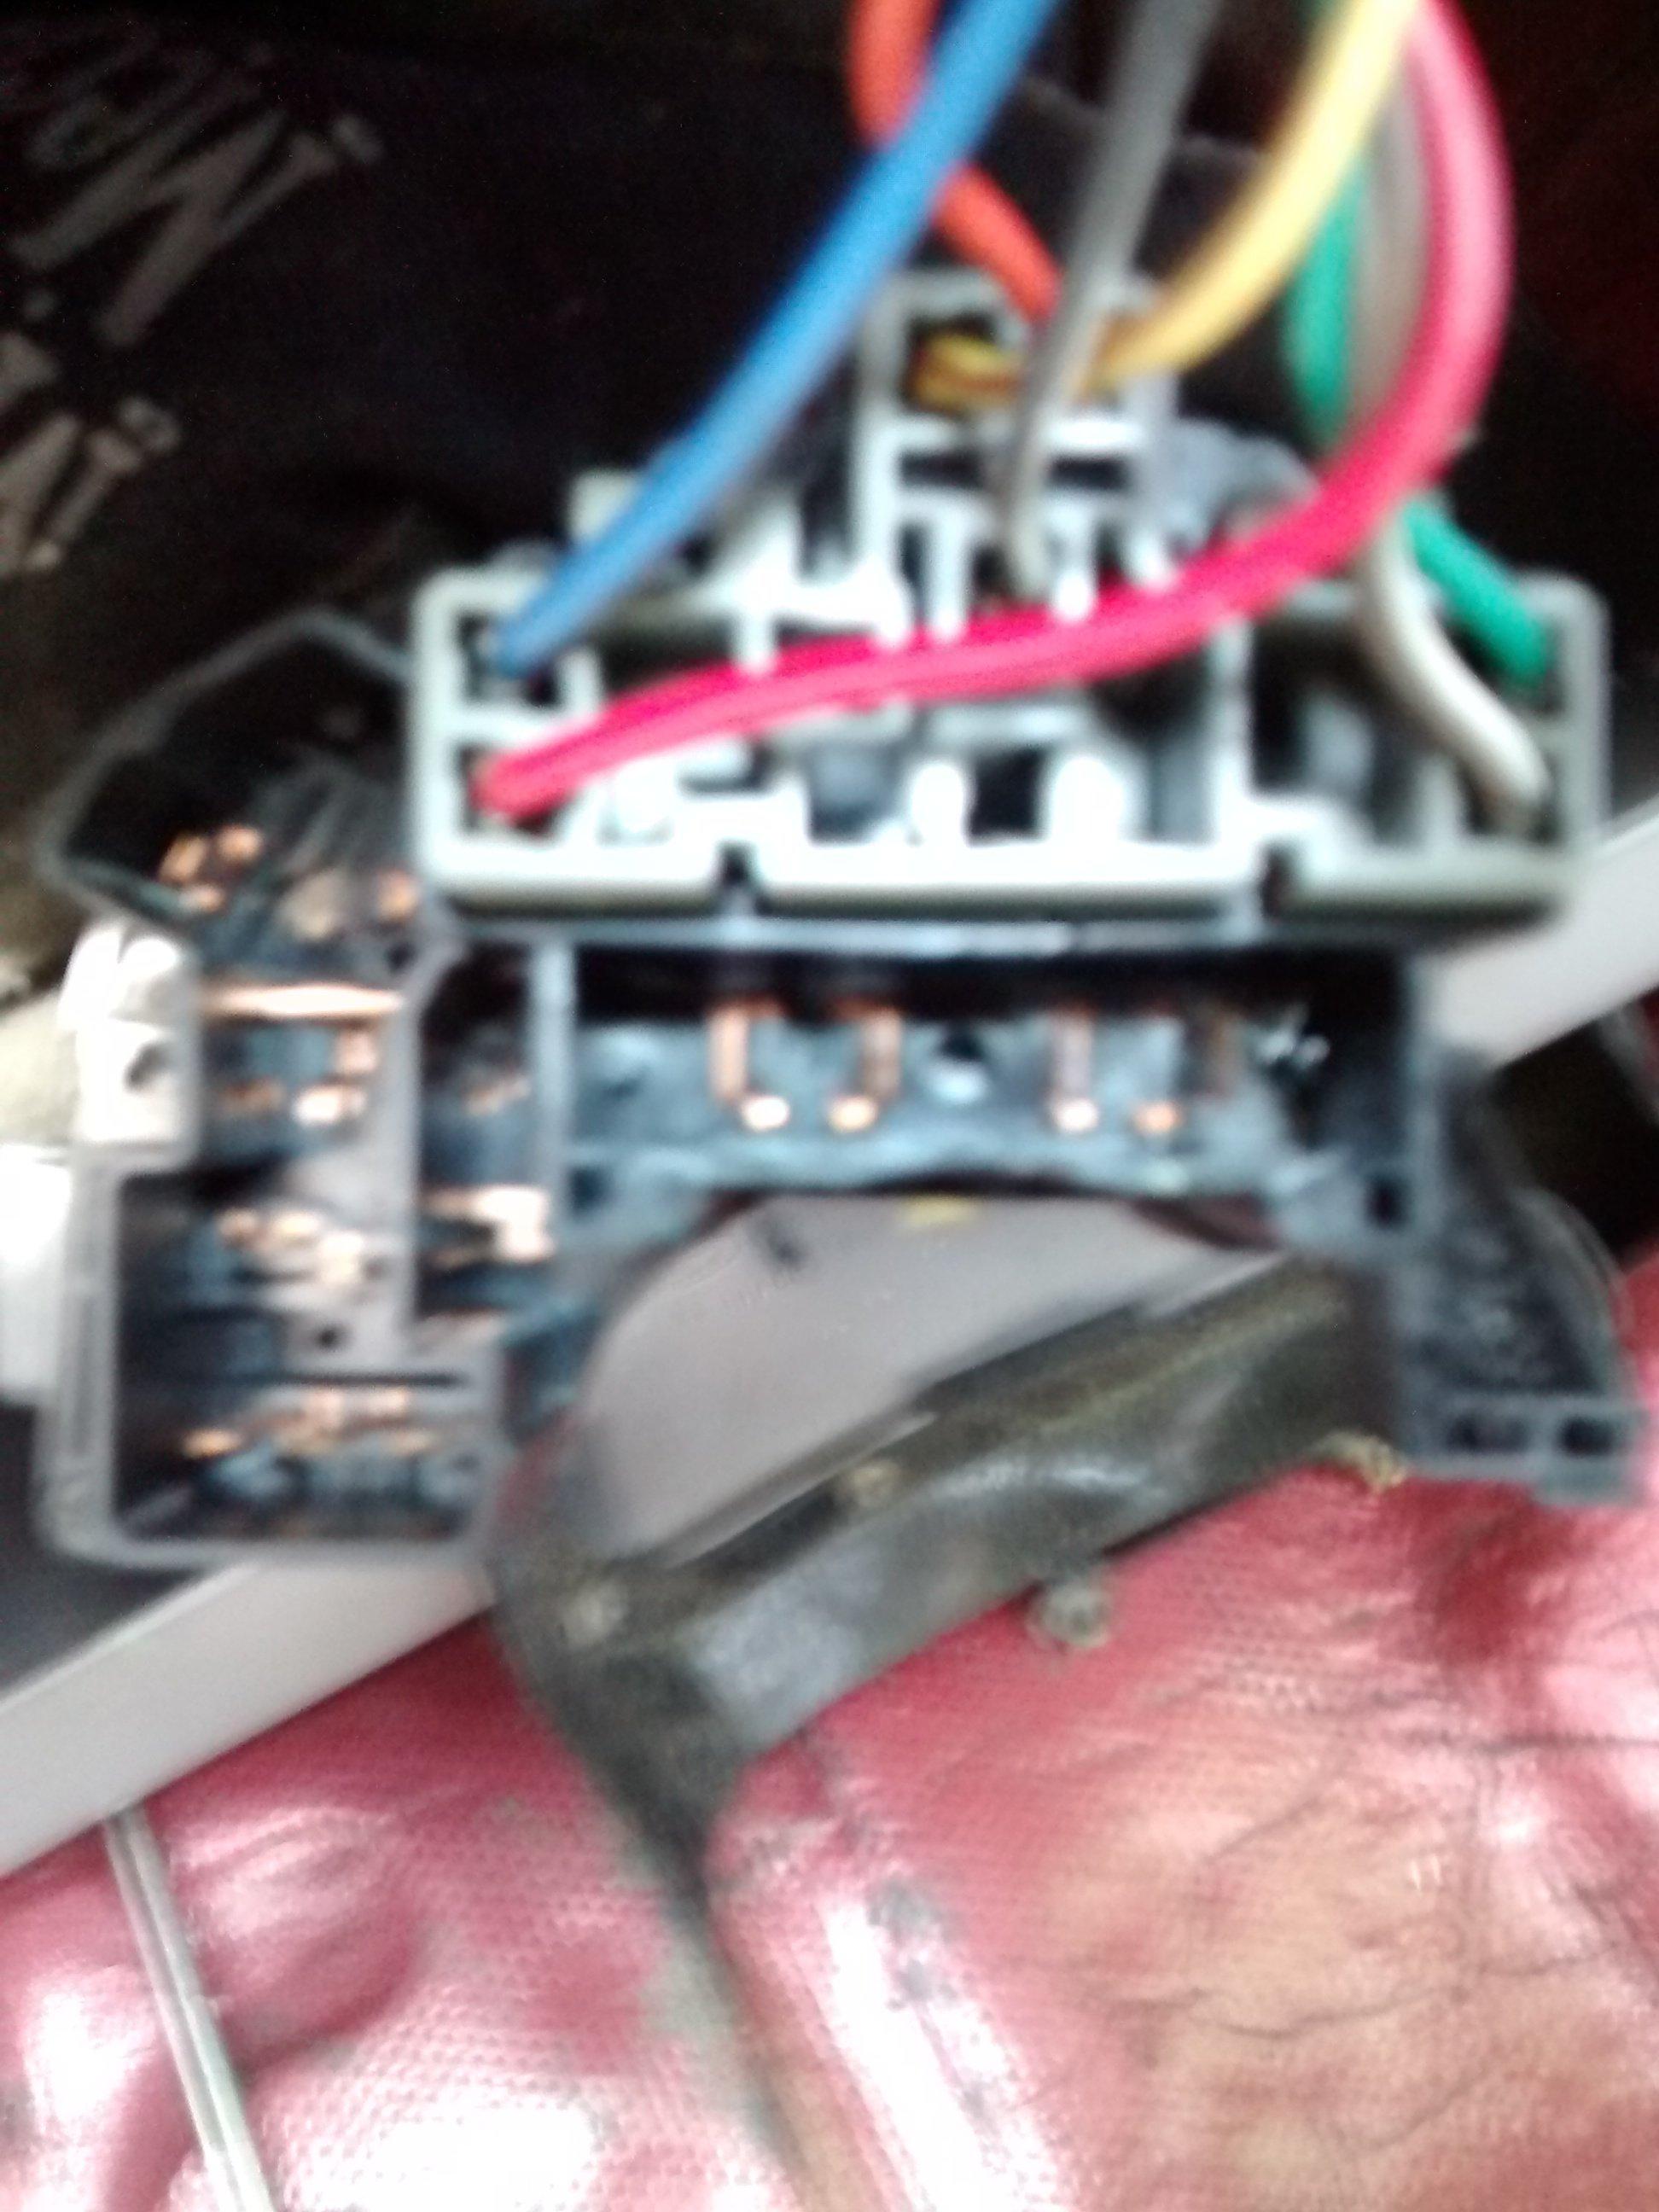 88 Mustang Turn Signal Wiring Diagram Wiring Diagram Camaro Camaro Graniantichiumbri It